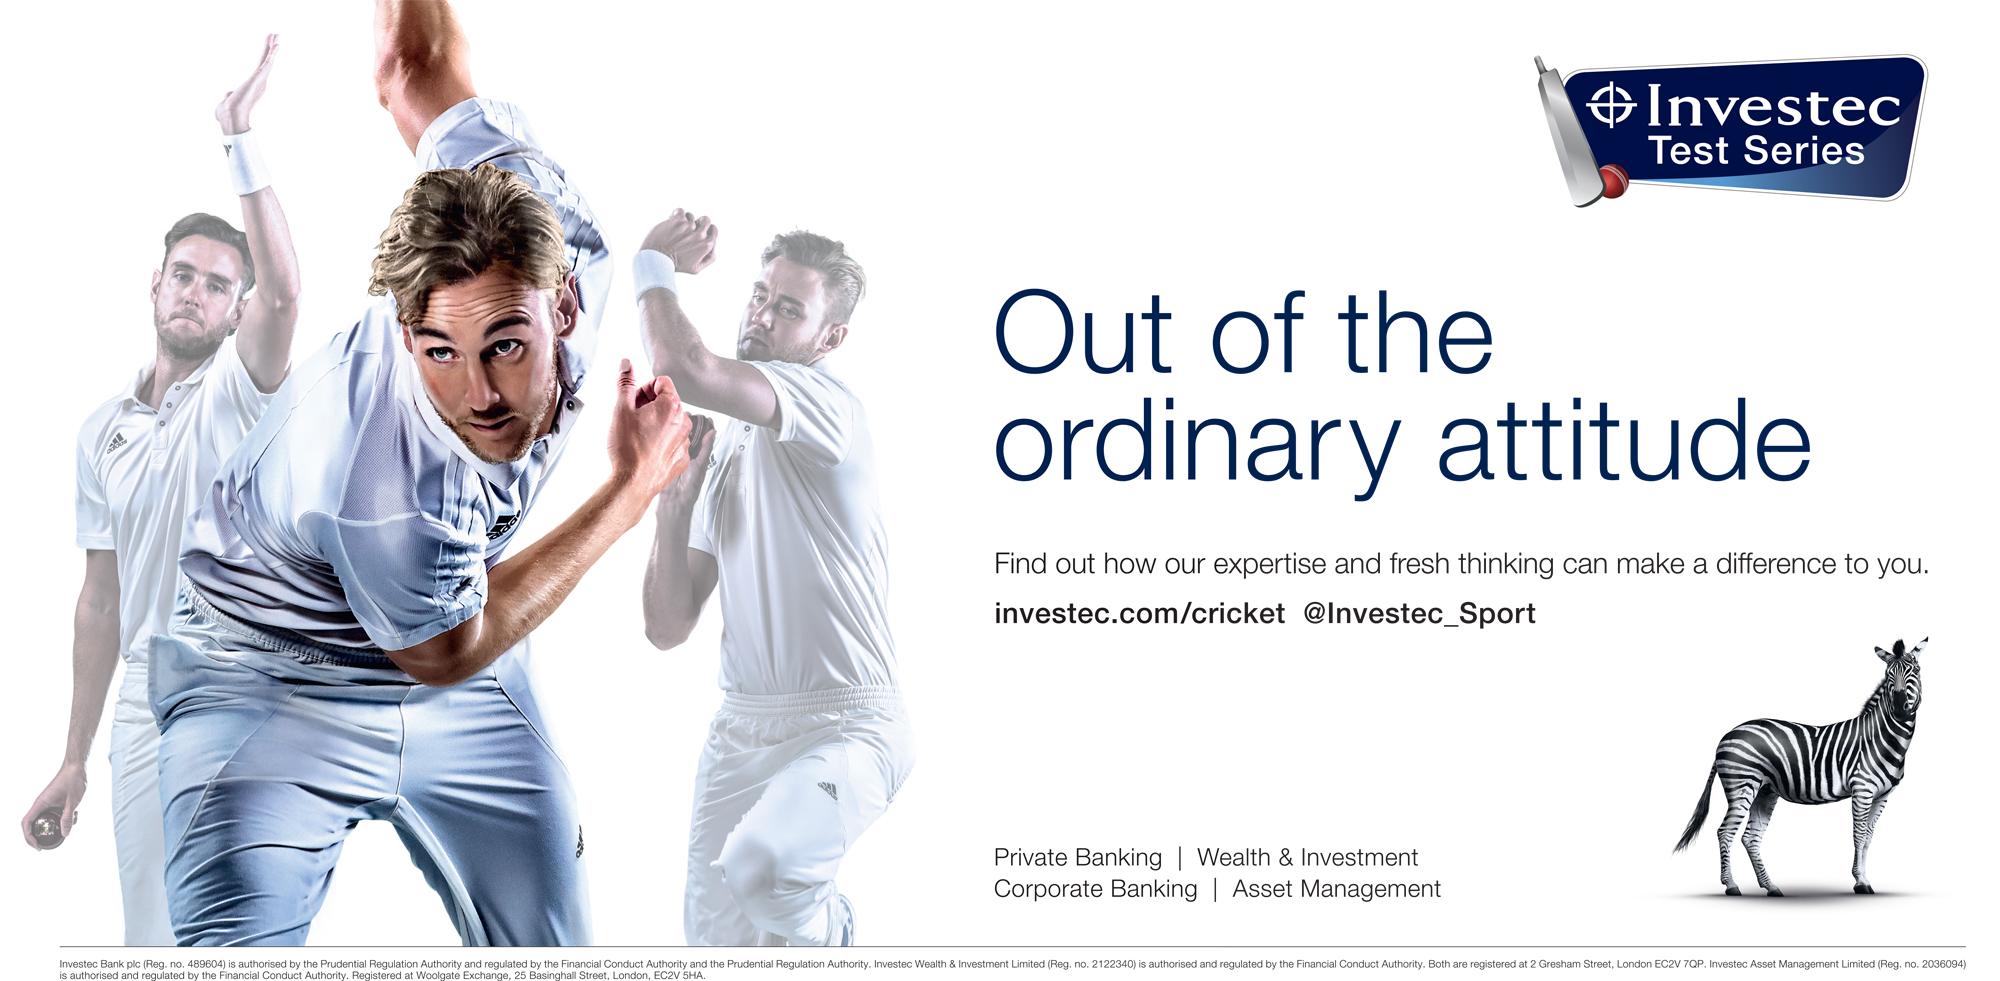 C39308.004_Cricket_LonUnderground_Jul17_3048x6060@10pc_v2_TS.jpg